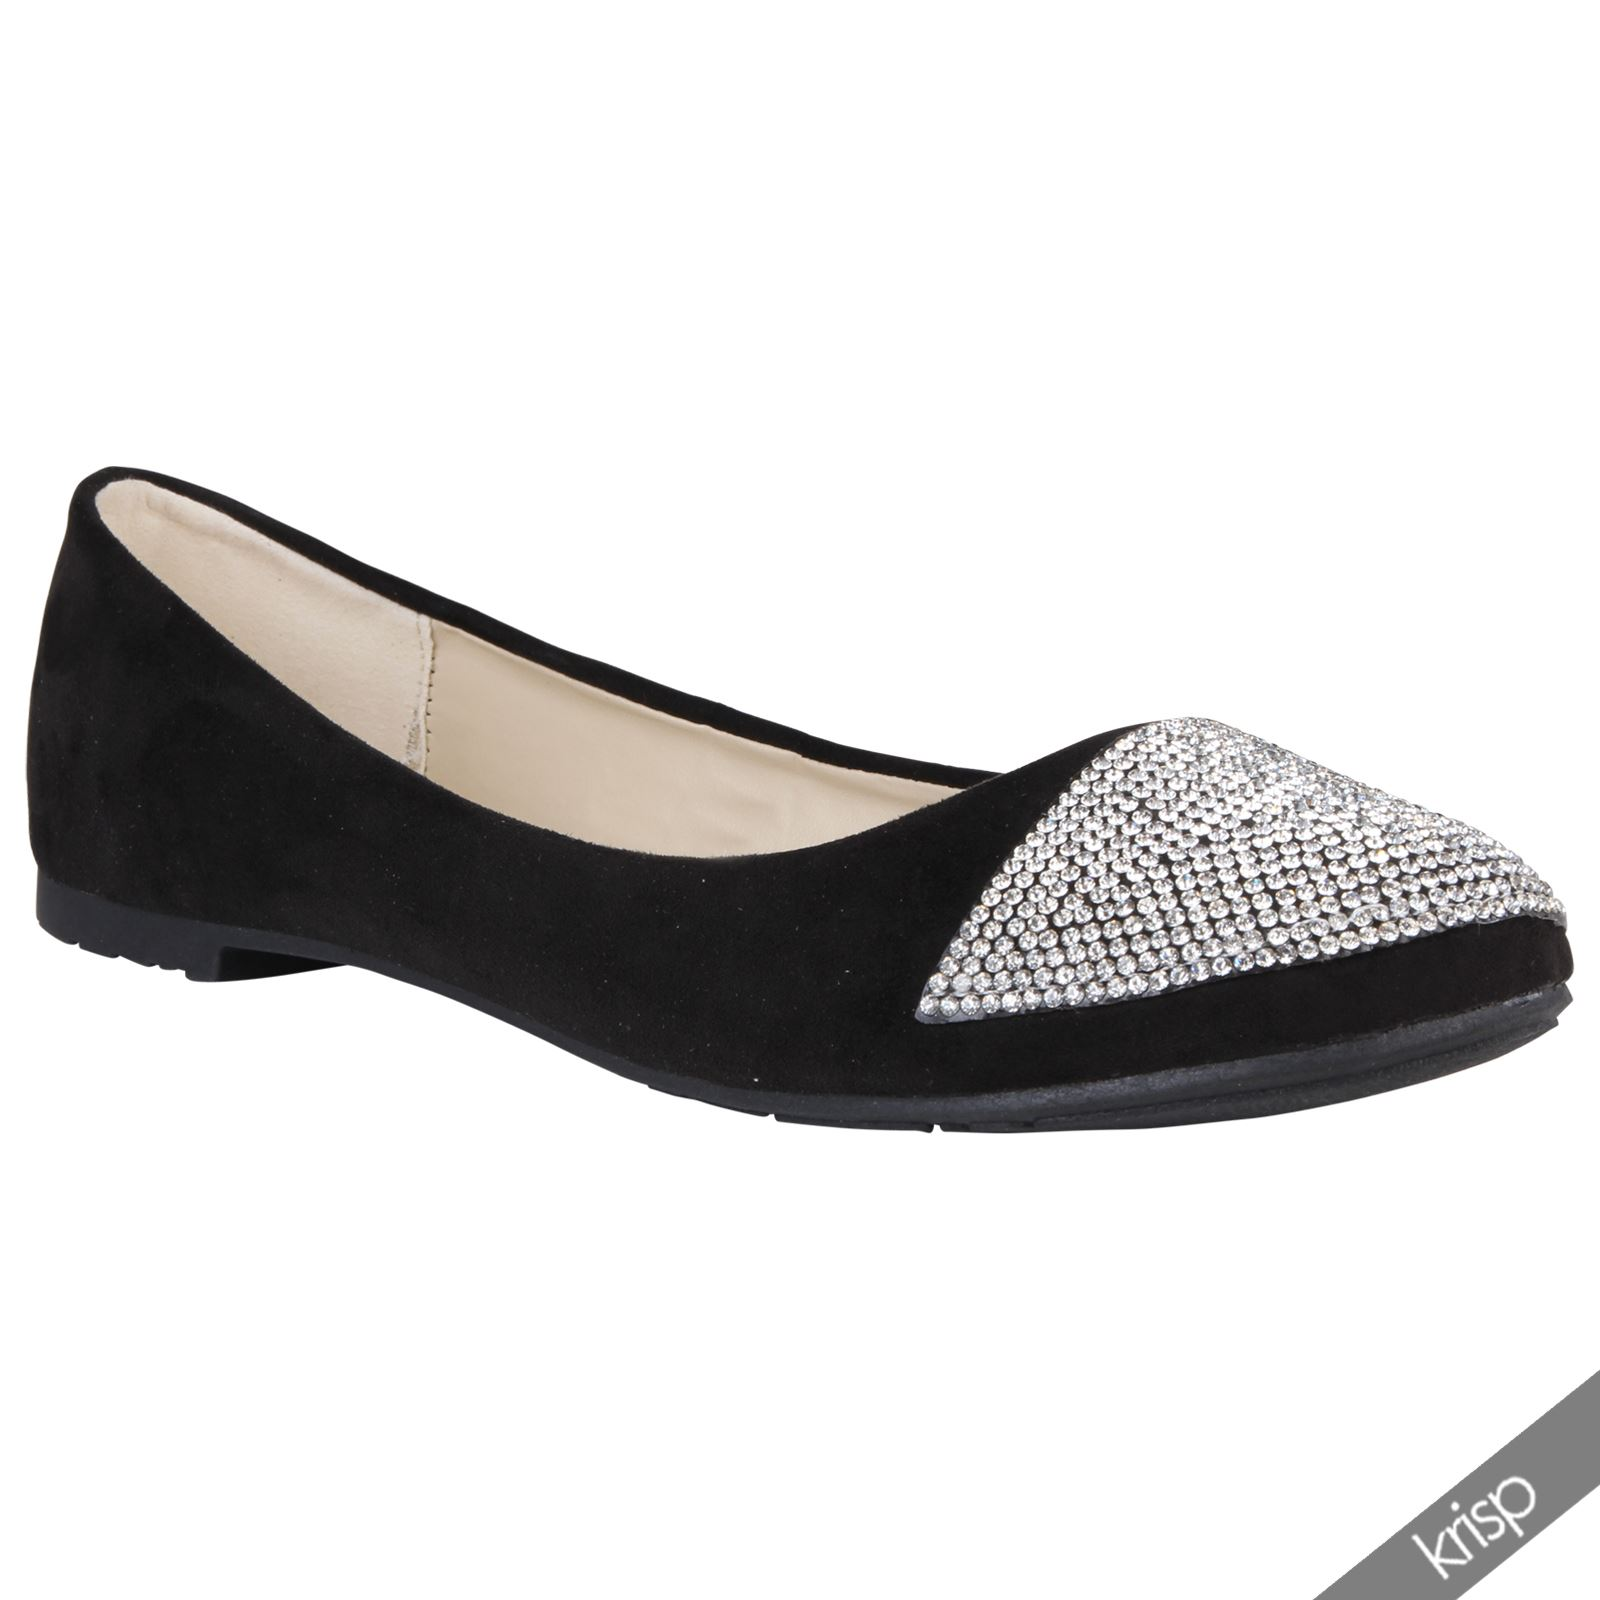 womens diamante toe suede ballerina flat heel dolly shoes